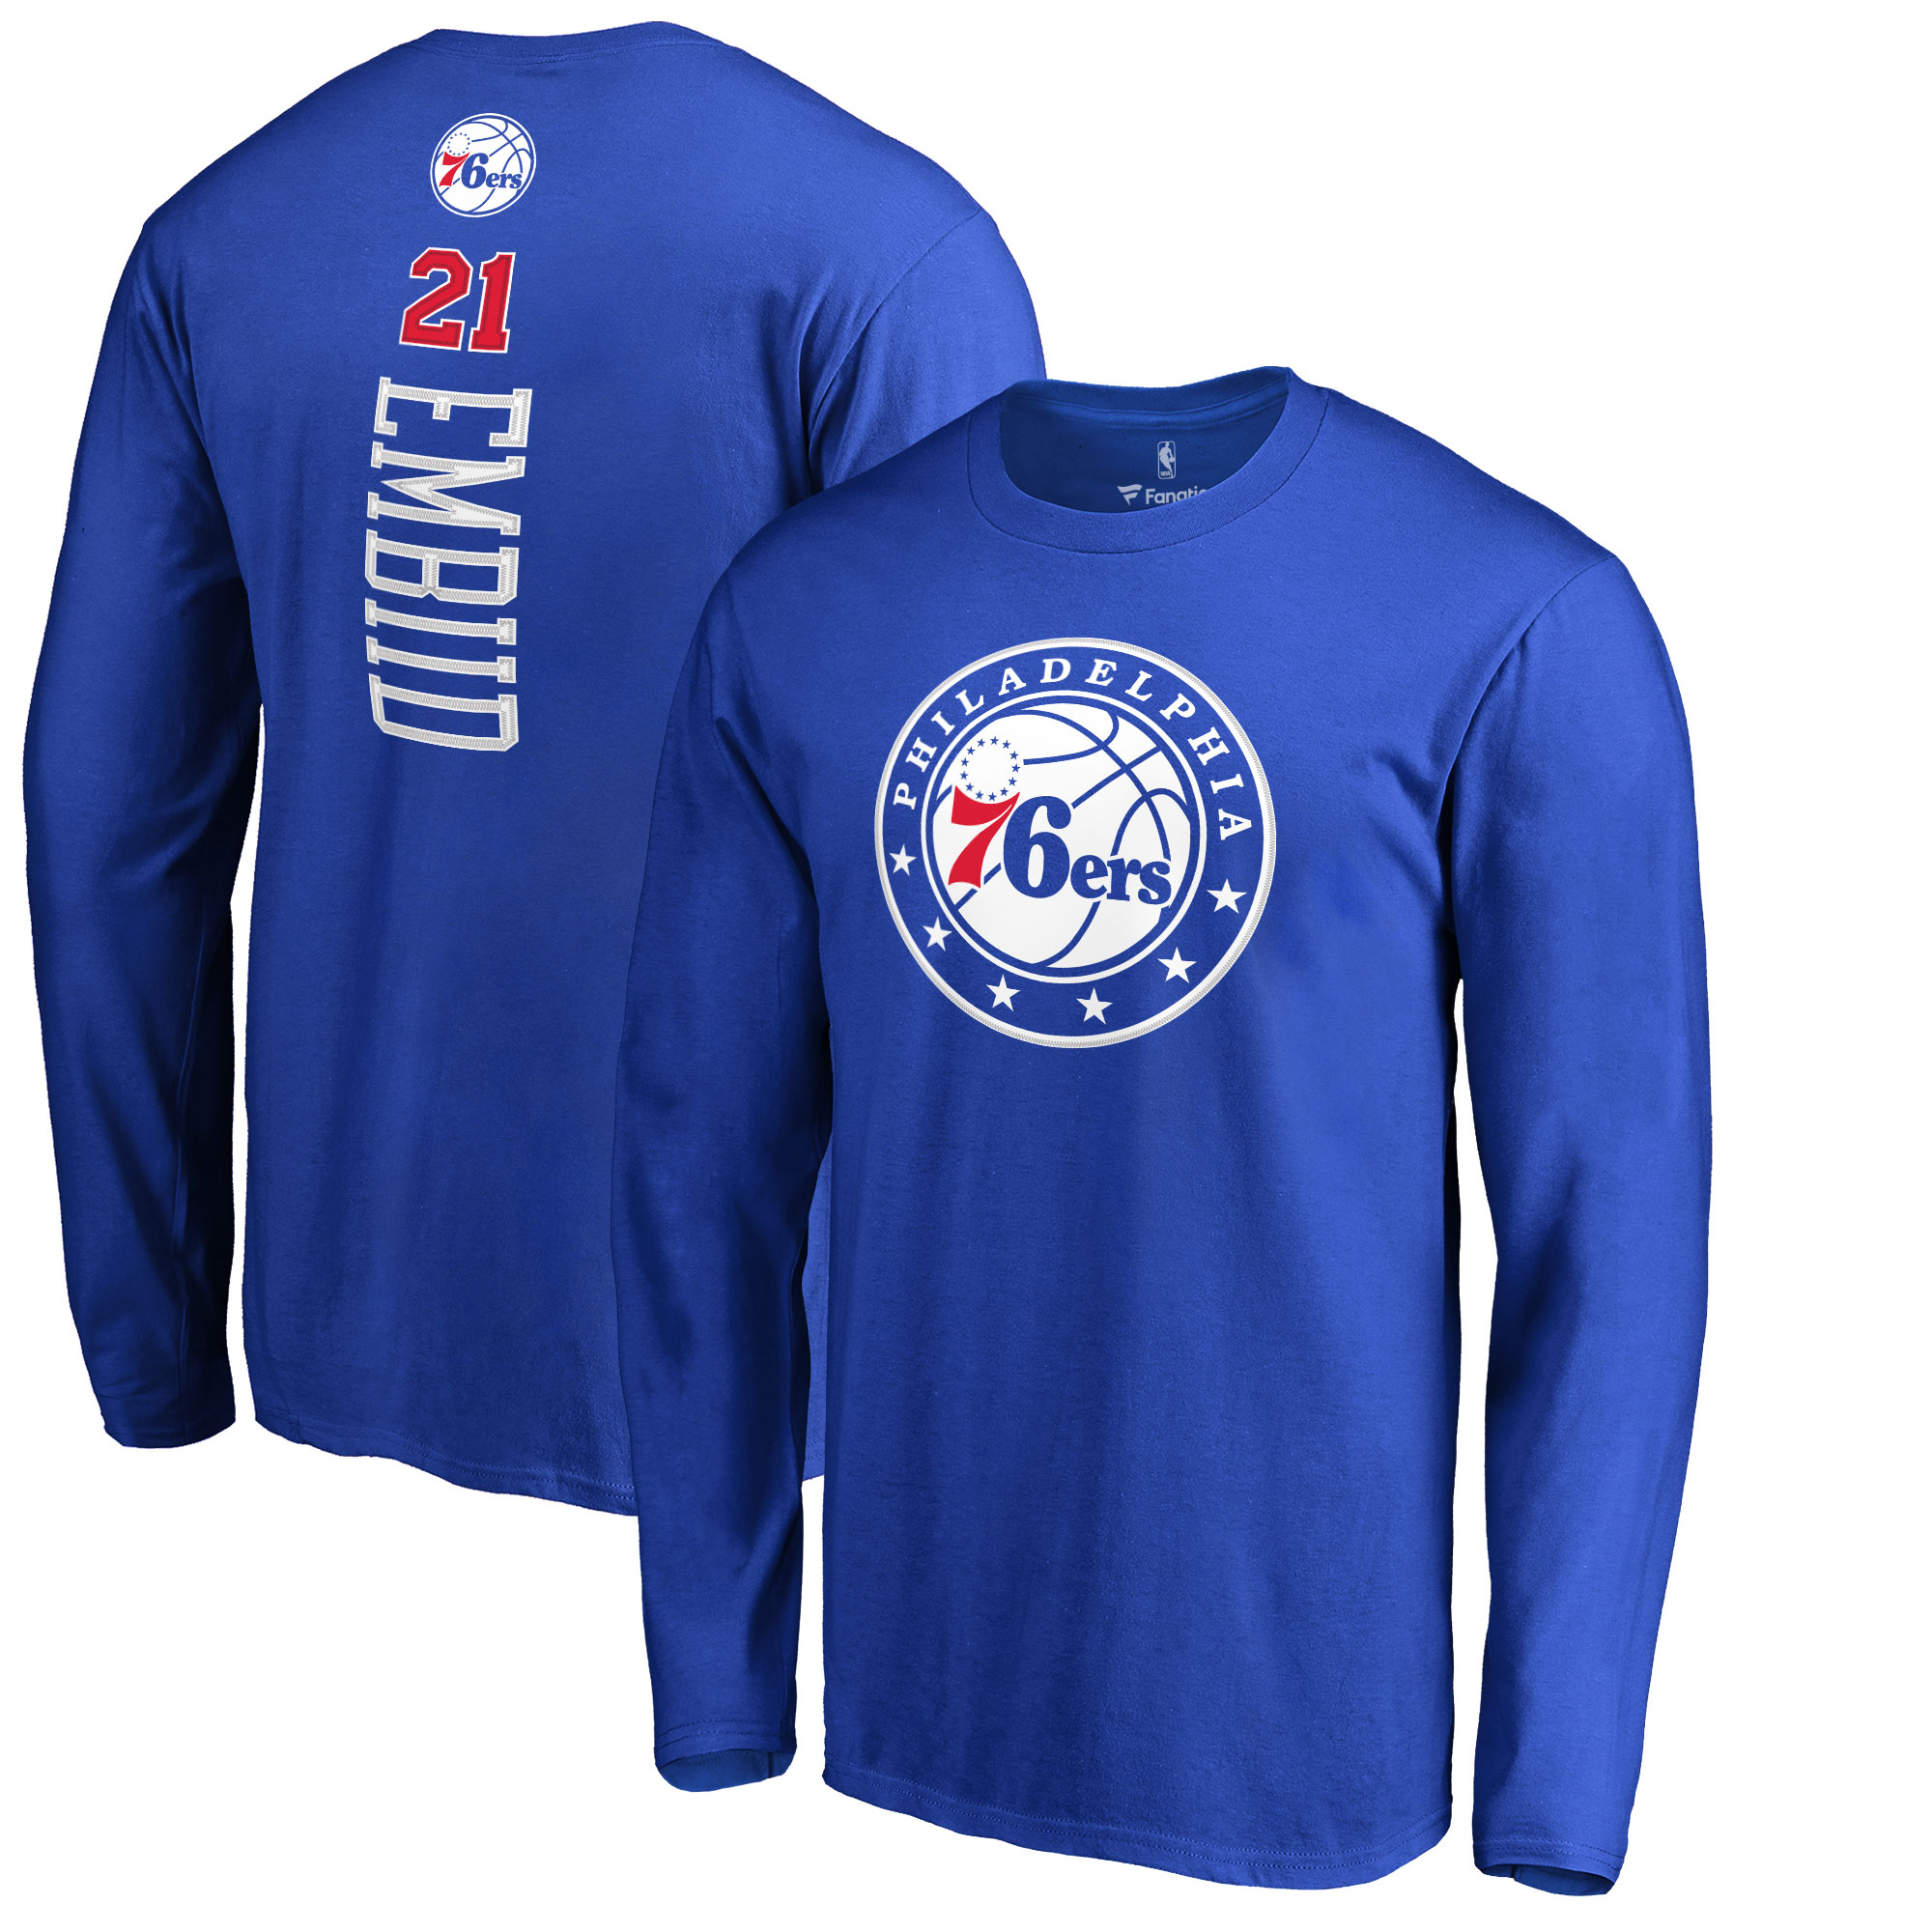 Joel Embiid Philadelphia 76ers Fanatics Branded Backer 3 Name & Number Long Sleeve T-Shirt - Royal